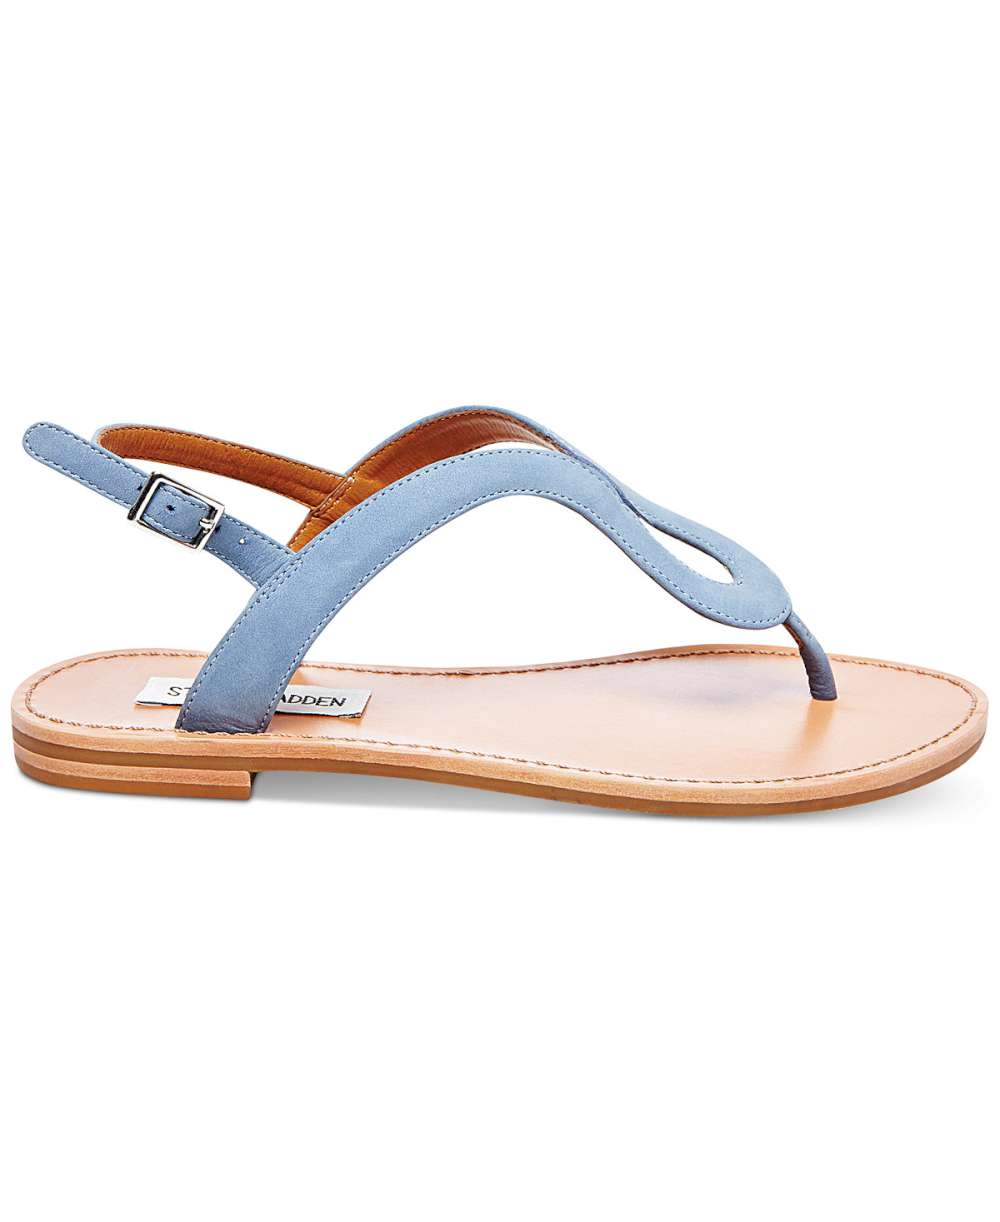 Steve Madden Womens Takeaway Leather Open Toe Casual Flat Sandals